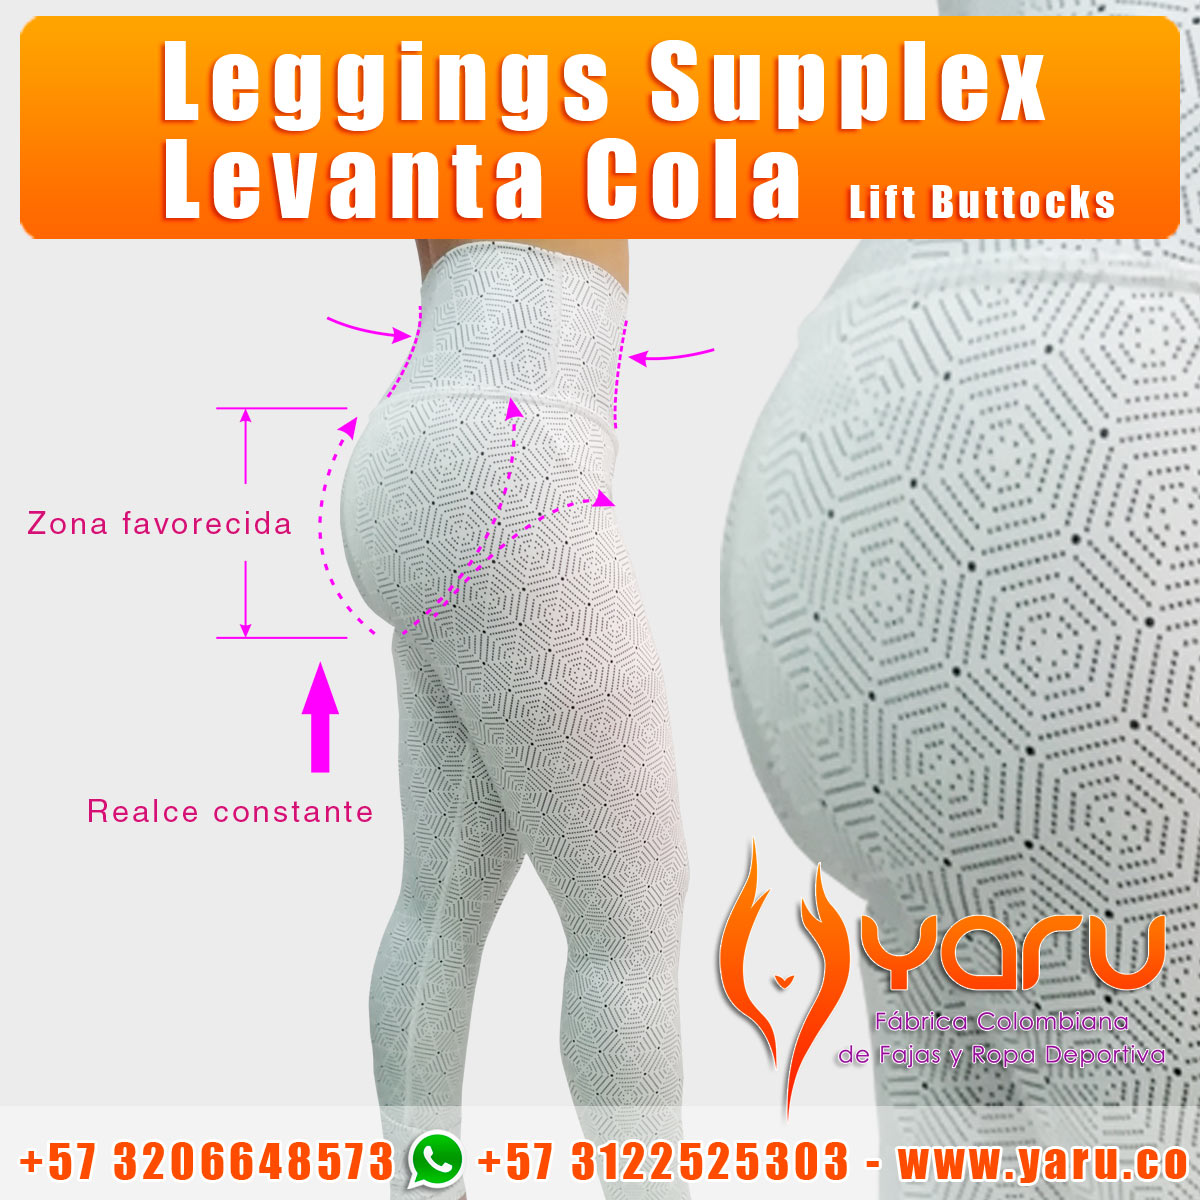 leggings supplex sublimado levantacola lift buttocks wholesaler fabrica Colombiana Ropa Deportiva 2019